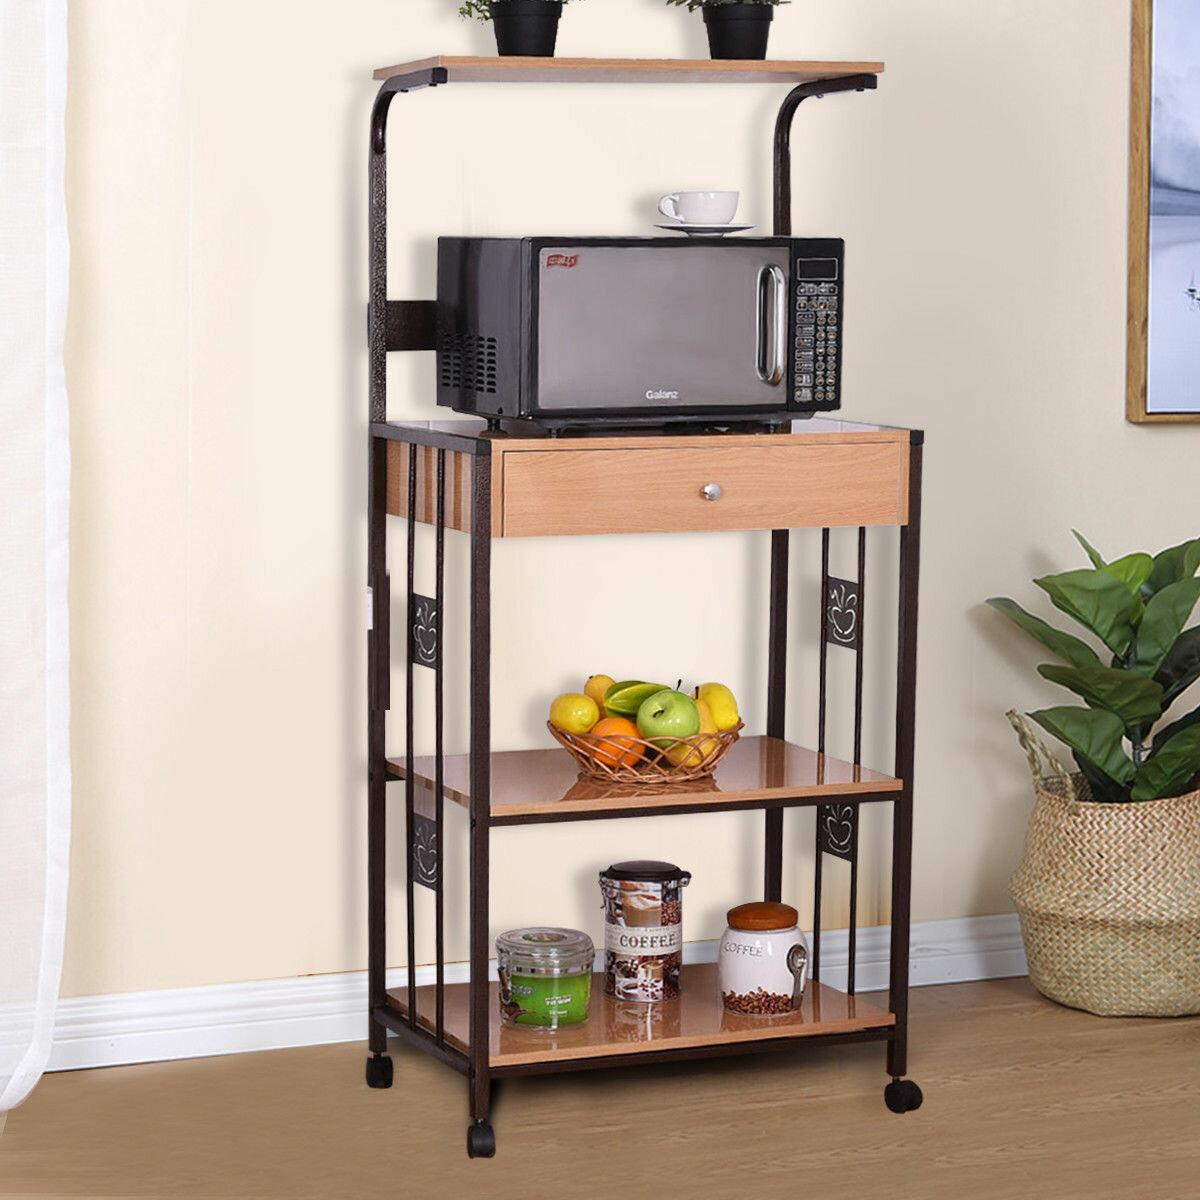 Kester Standard Microwave Stand